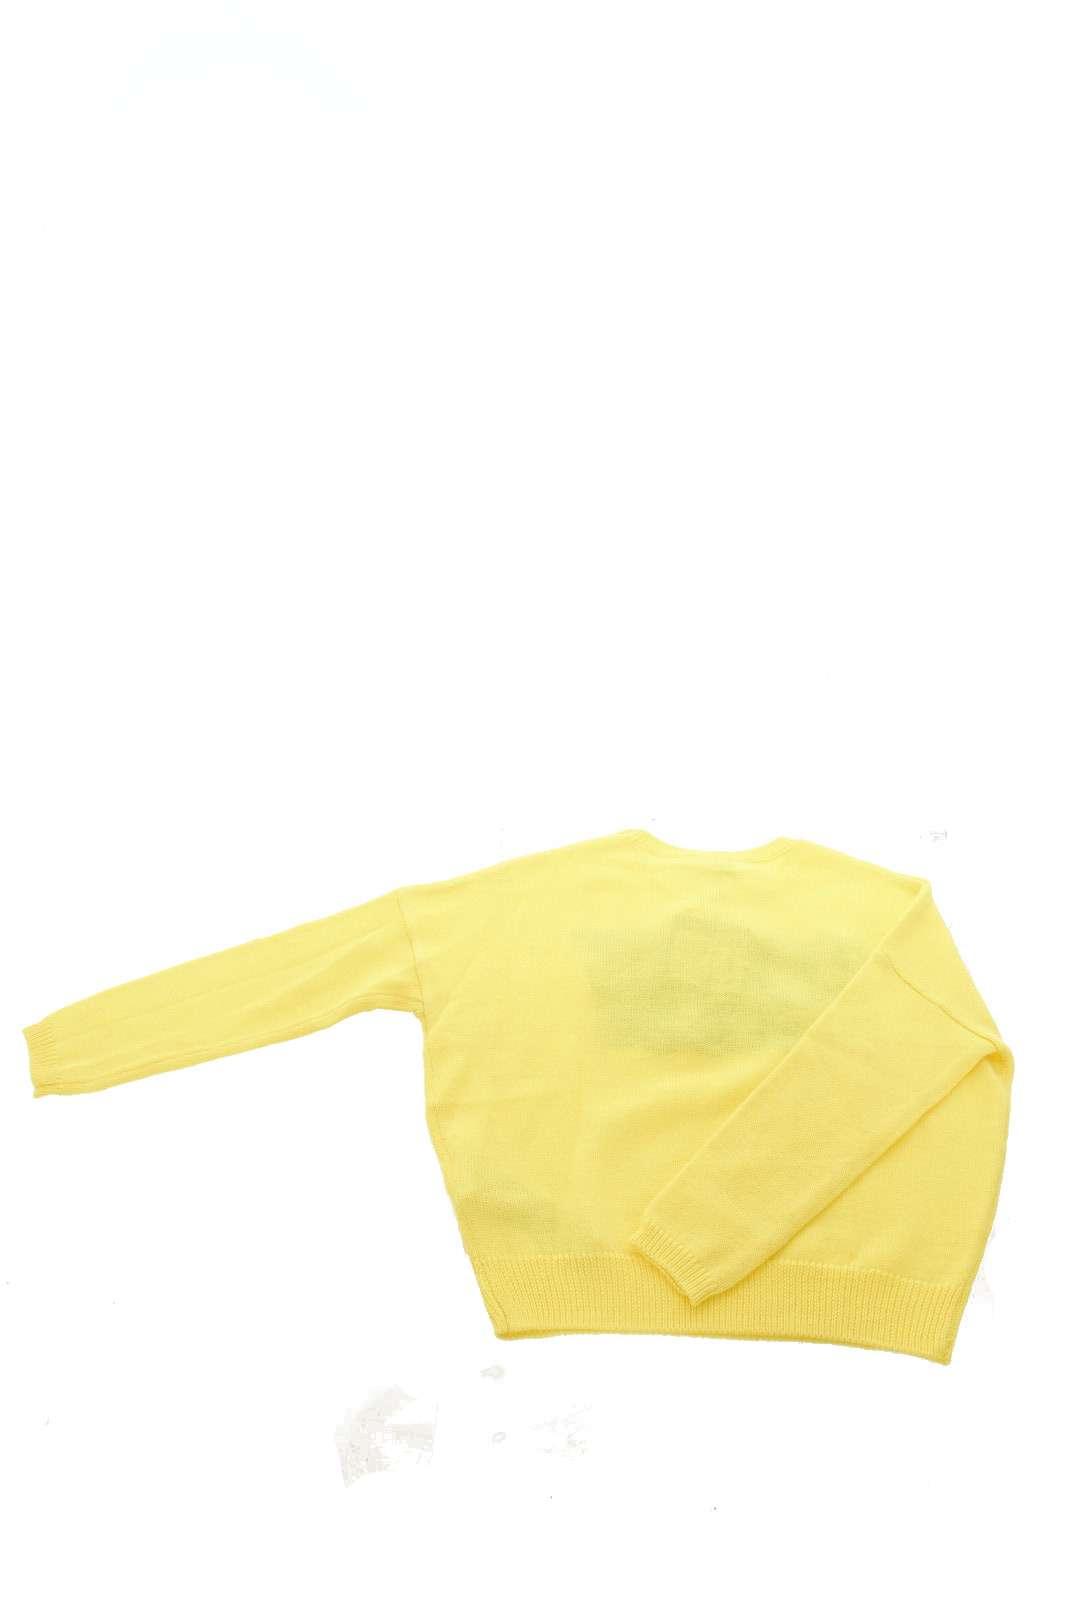 https://www.parmax.com/media/catalog/product/a/i/AI-outlet_parmax-maglia-bambina-Liu%20Jo-g68053ma28h-B_1.jpg